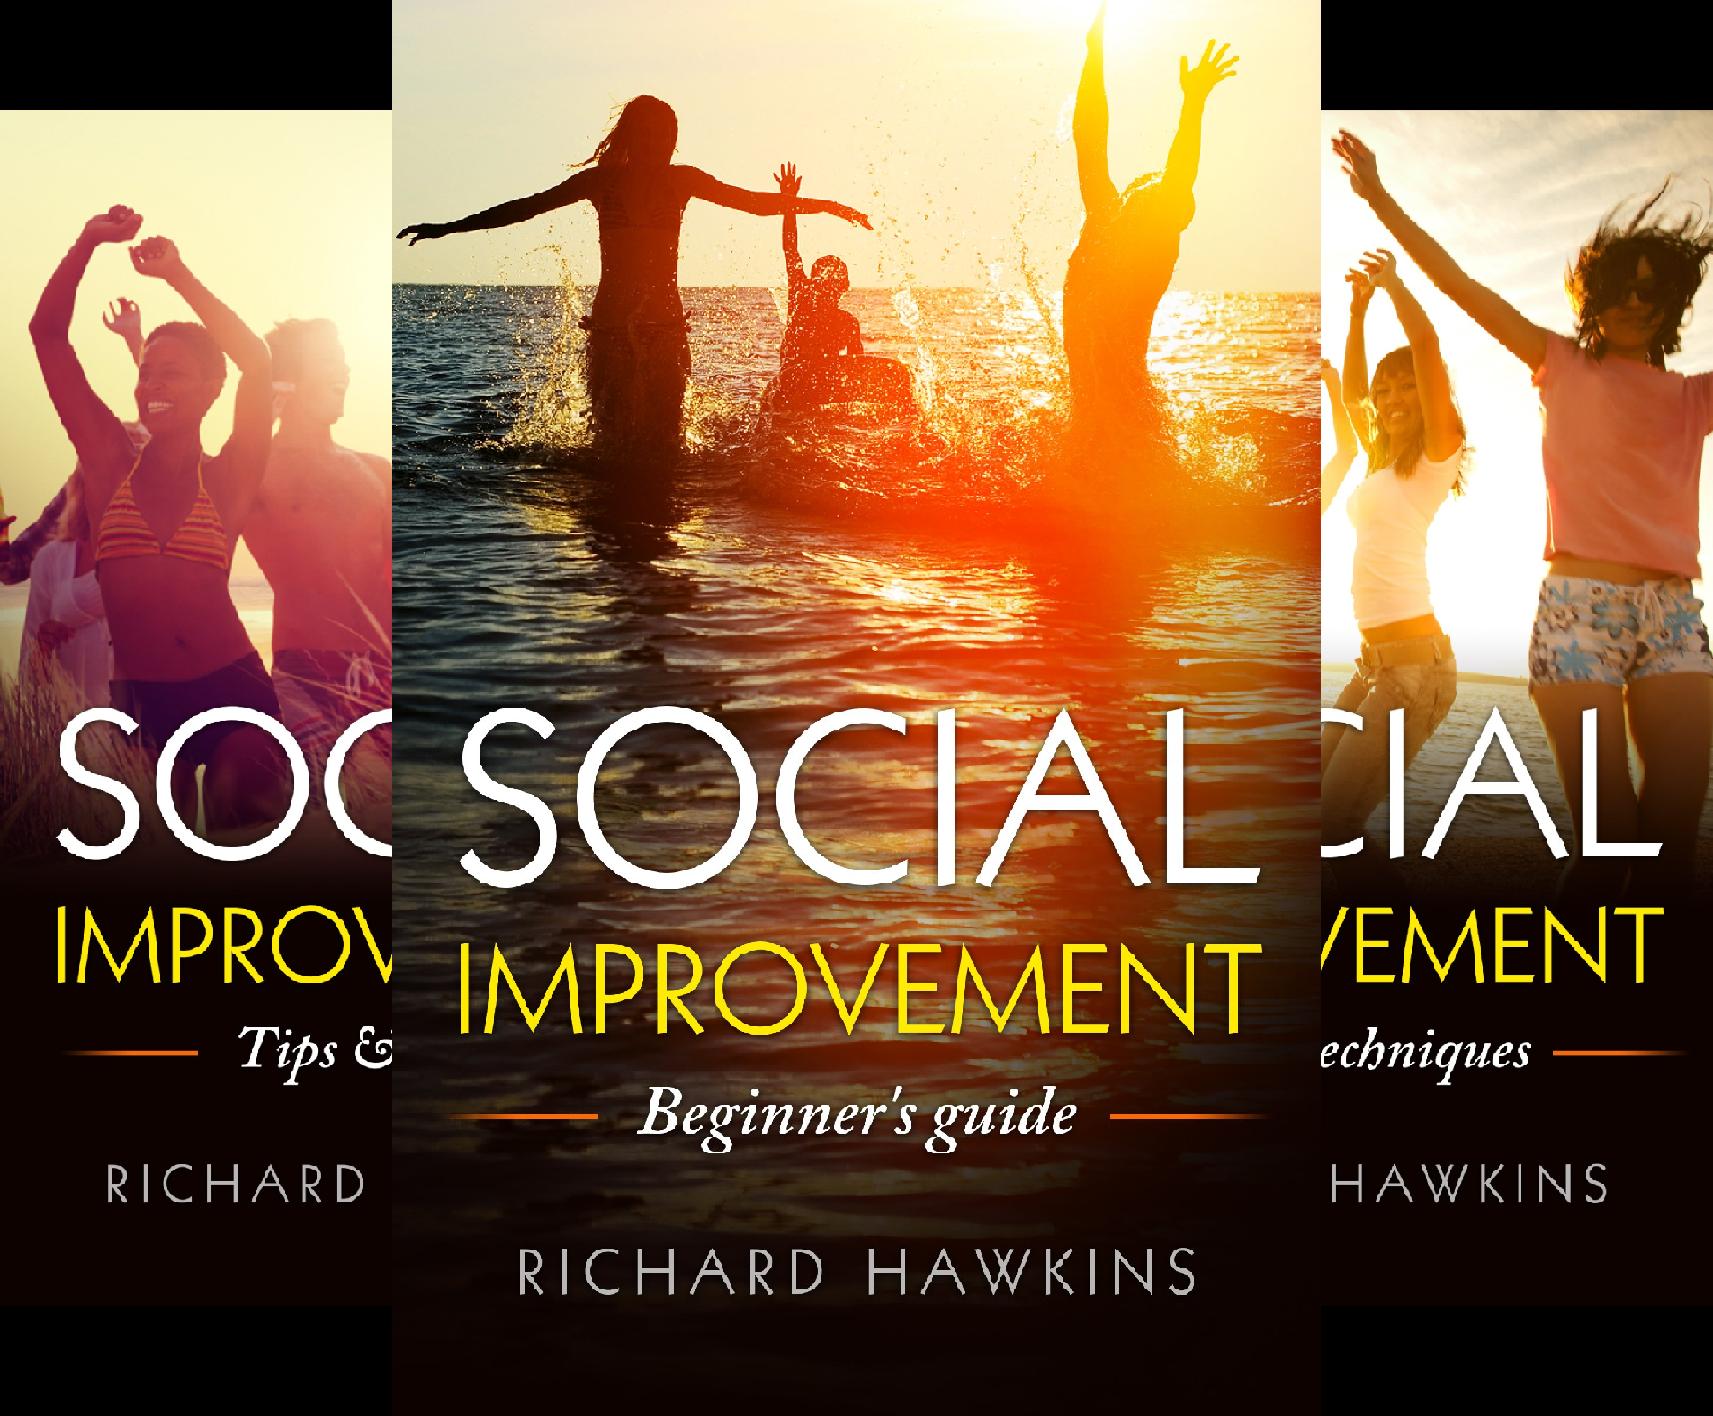 Social Improvement (5 Book Series)